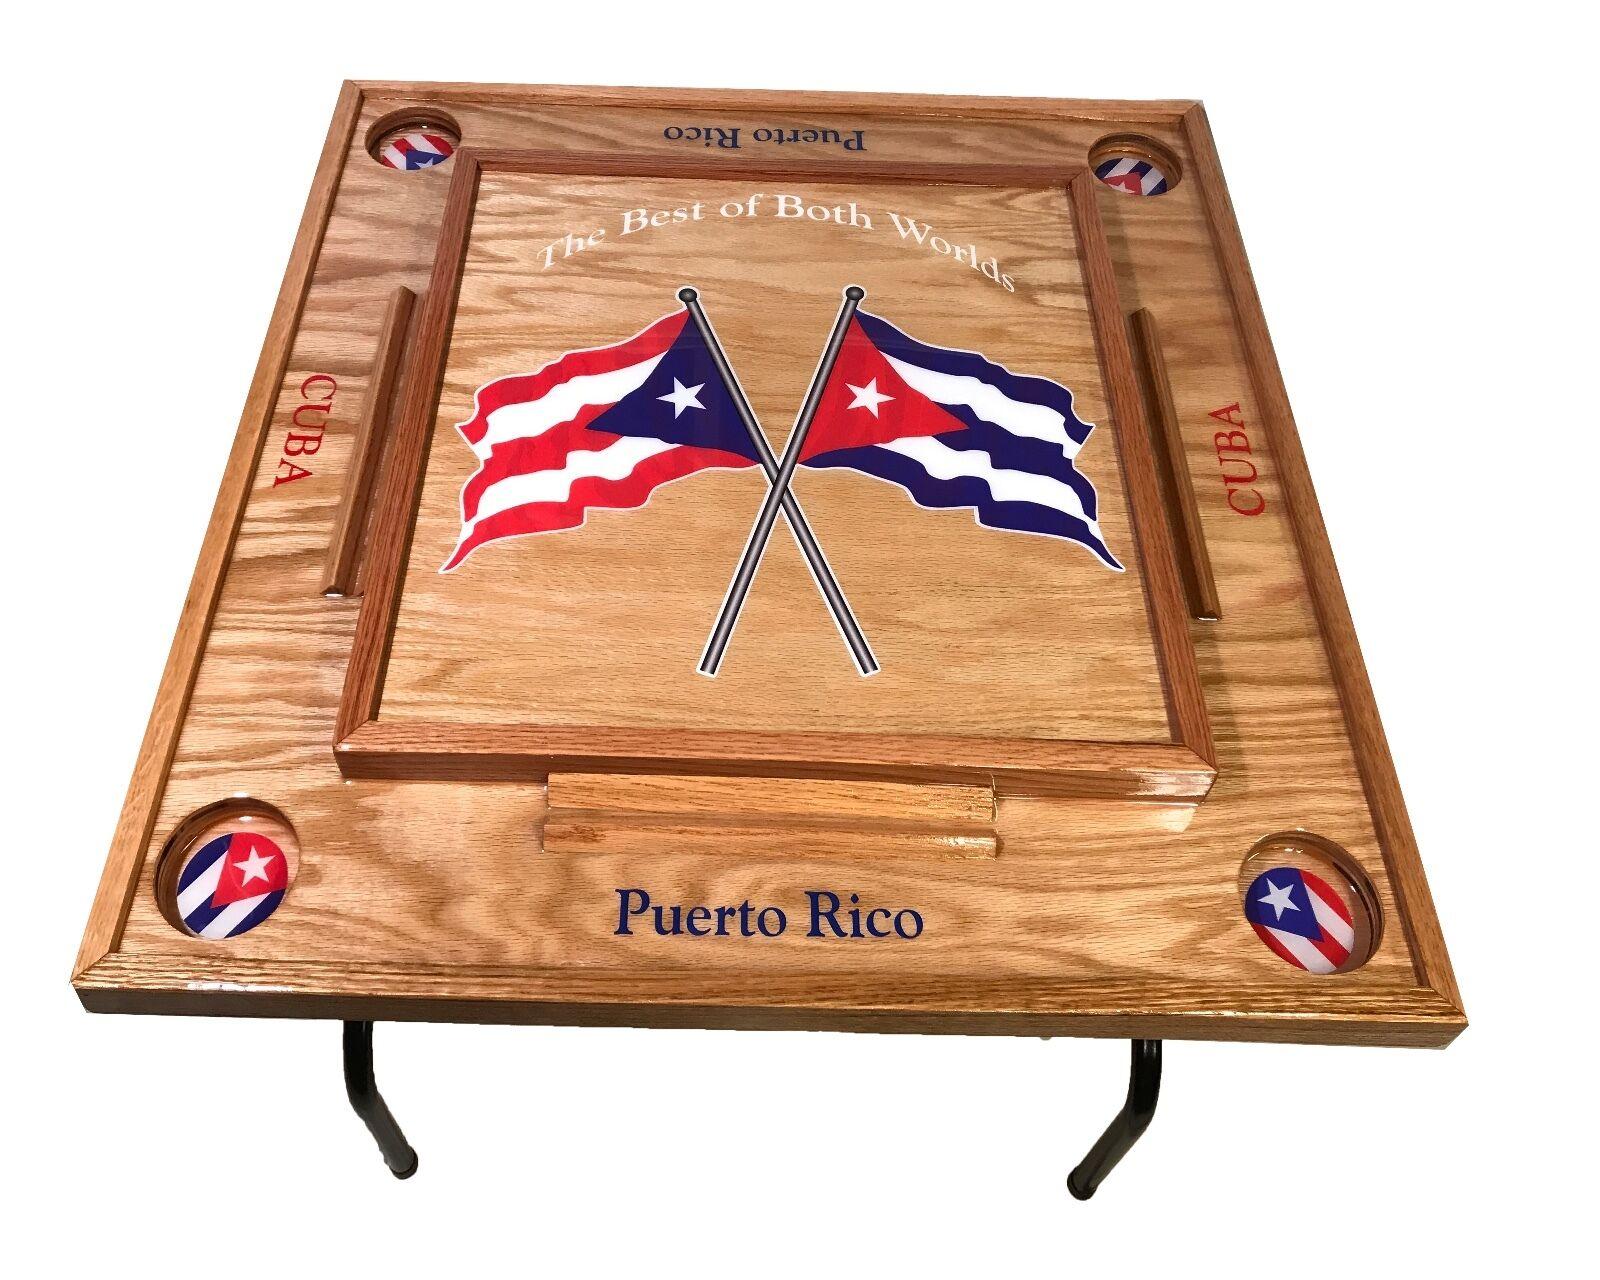 Puerto Rico et Cuba Domino Table